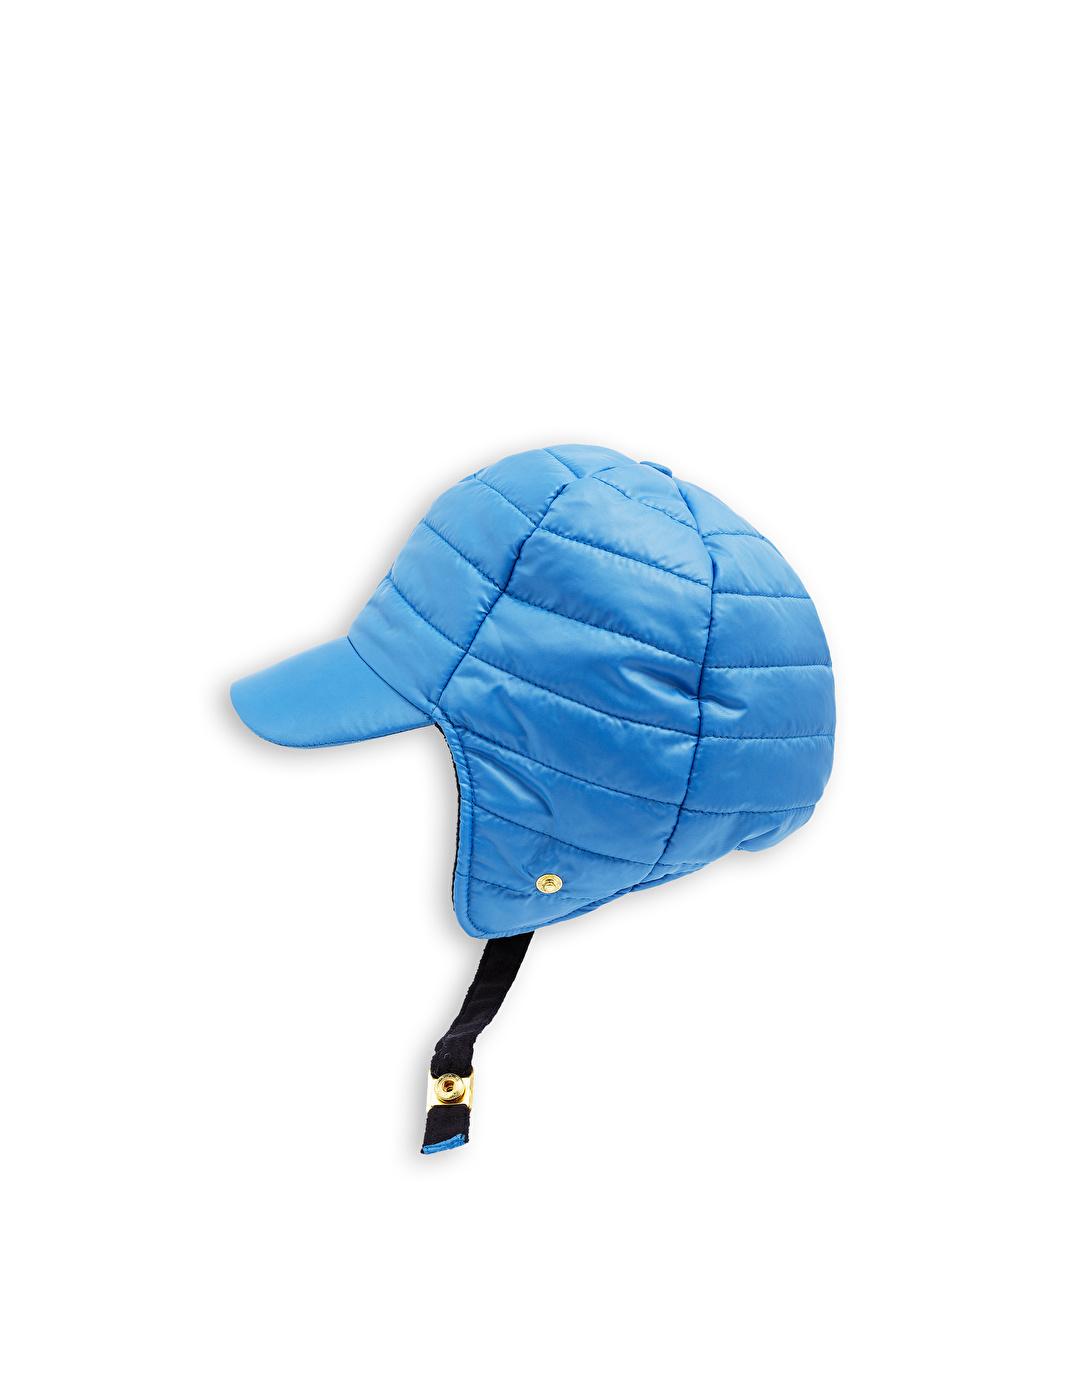 1776512050-4-mini-rodini-insulator-cap-light-blue